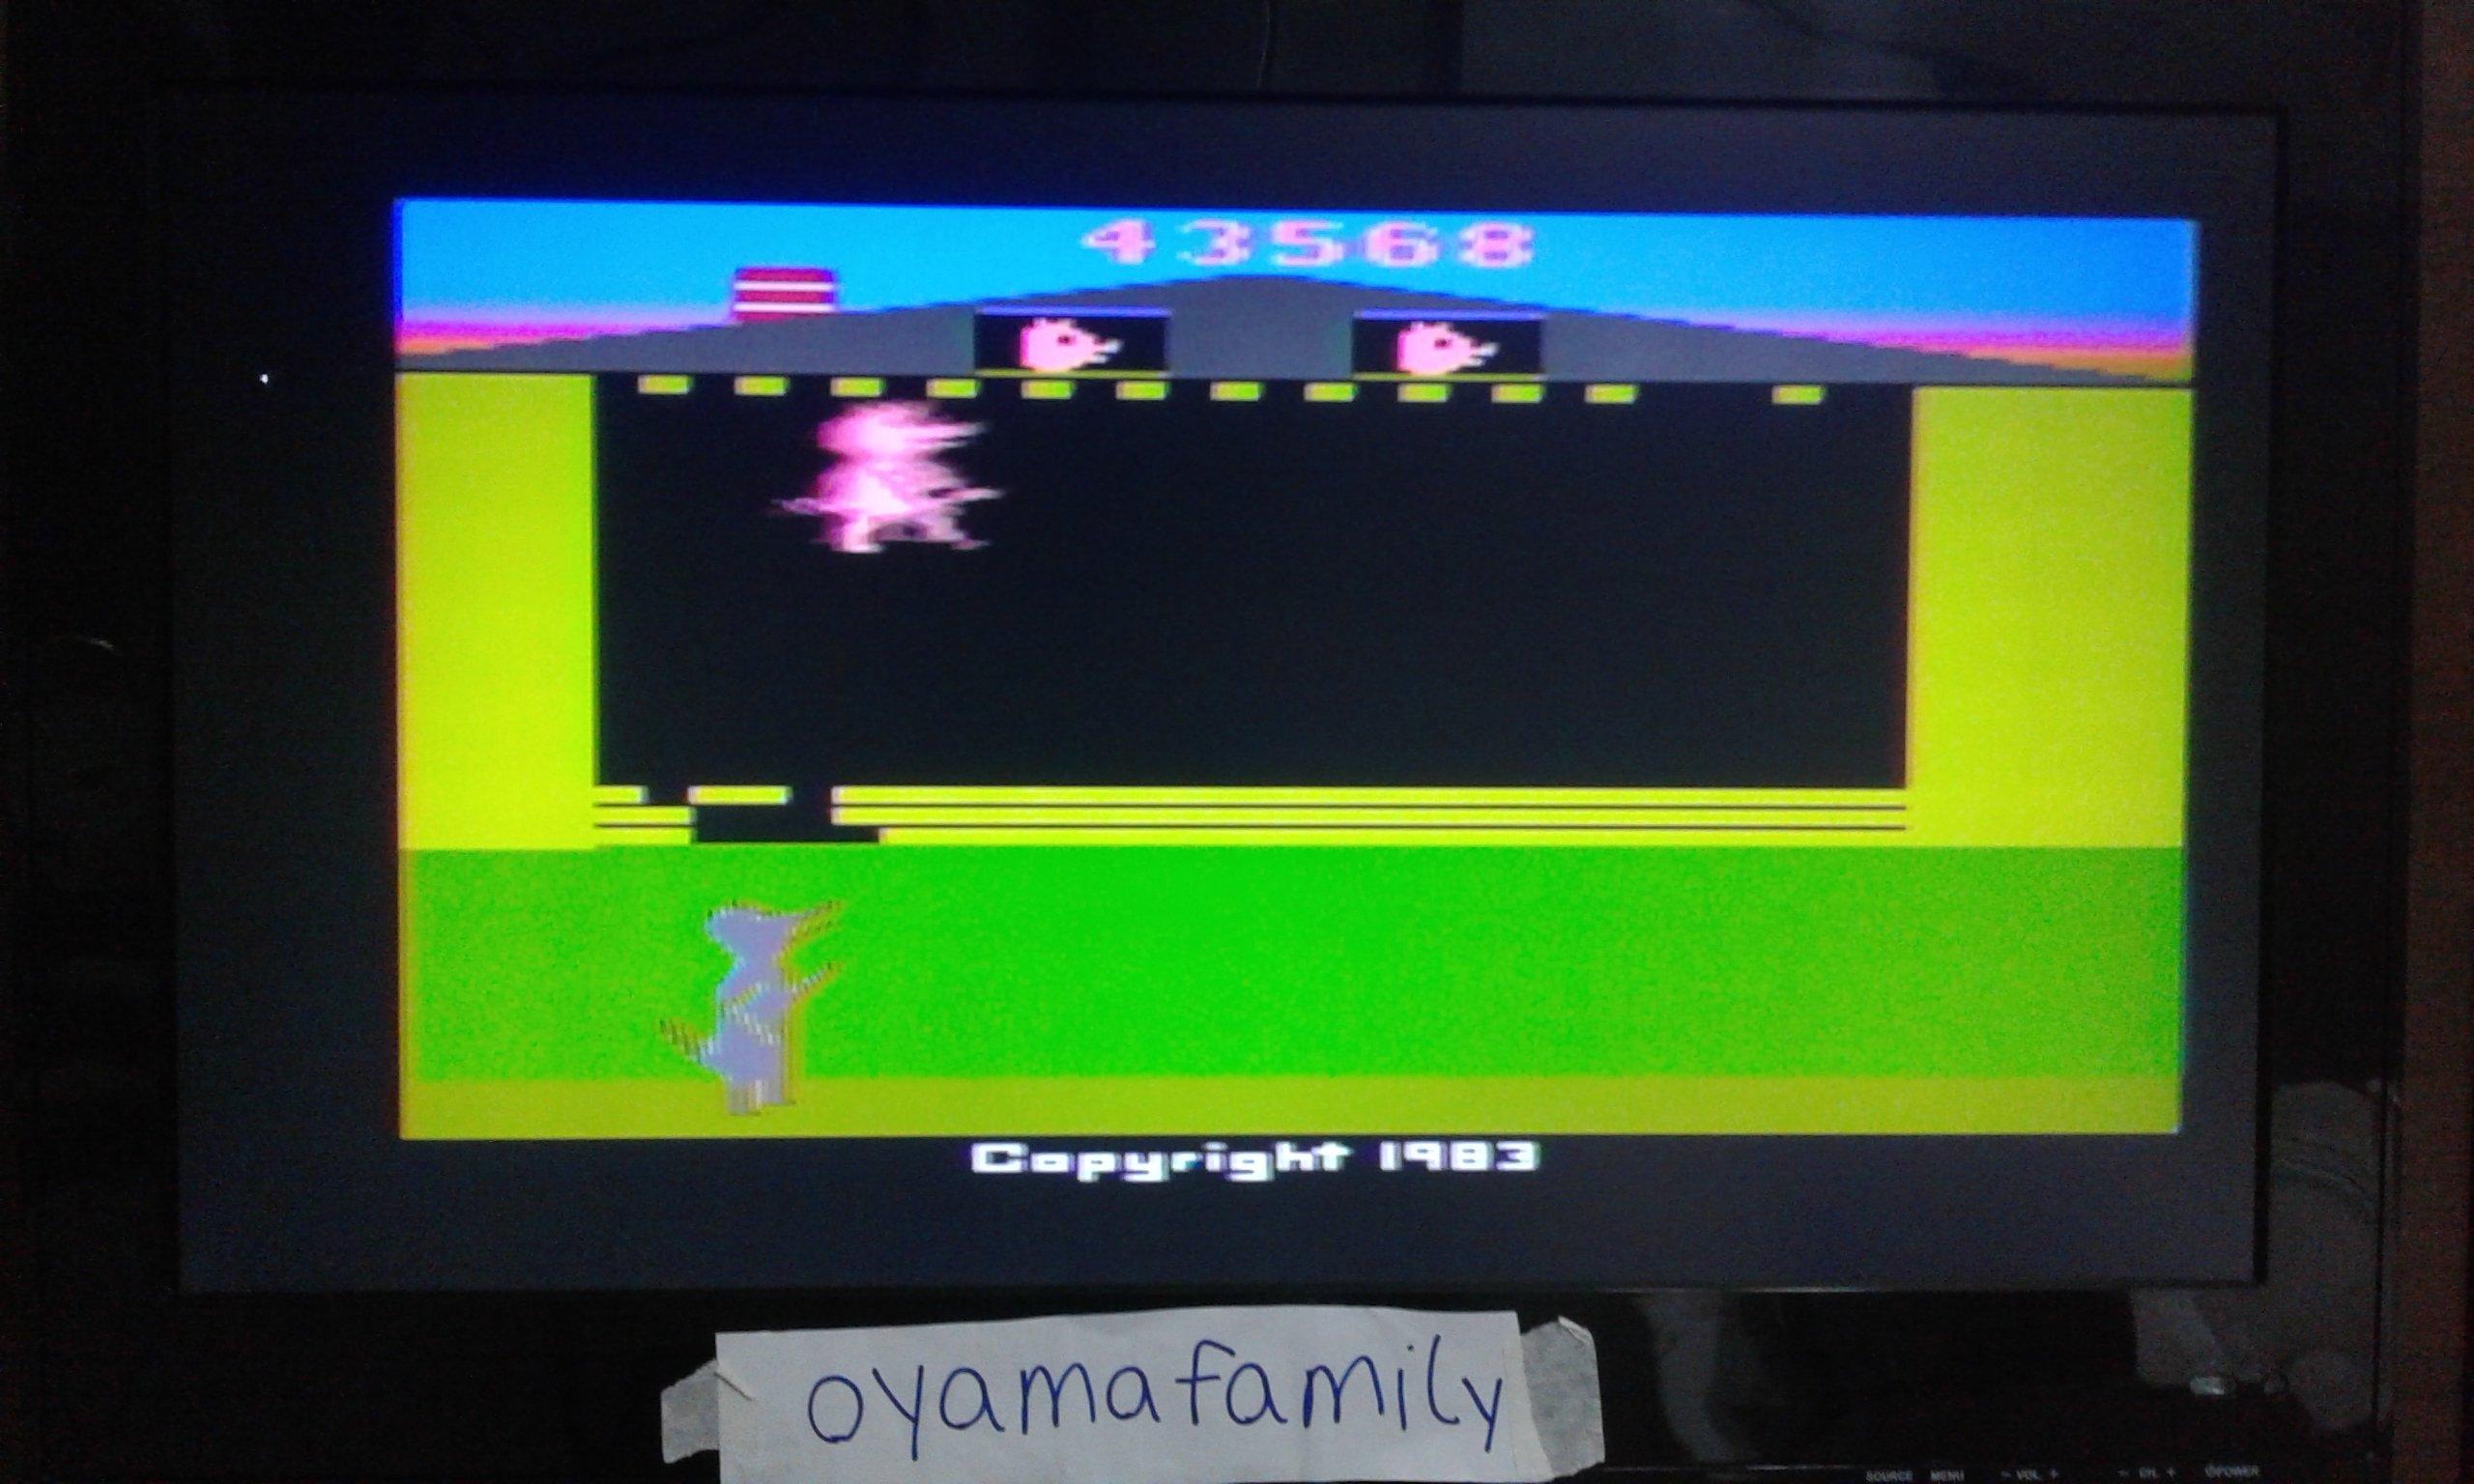 oyamafamily: Oink! (Atari 2600 Novice/B) 43,568 points on 2020-01-24 12:47:44